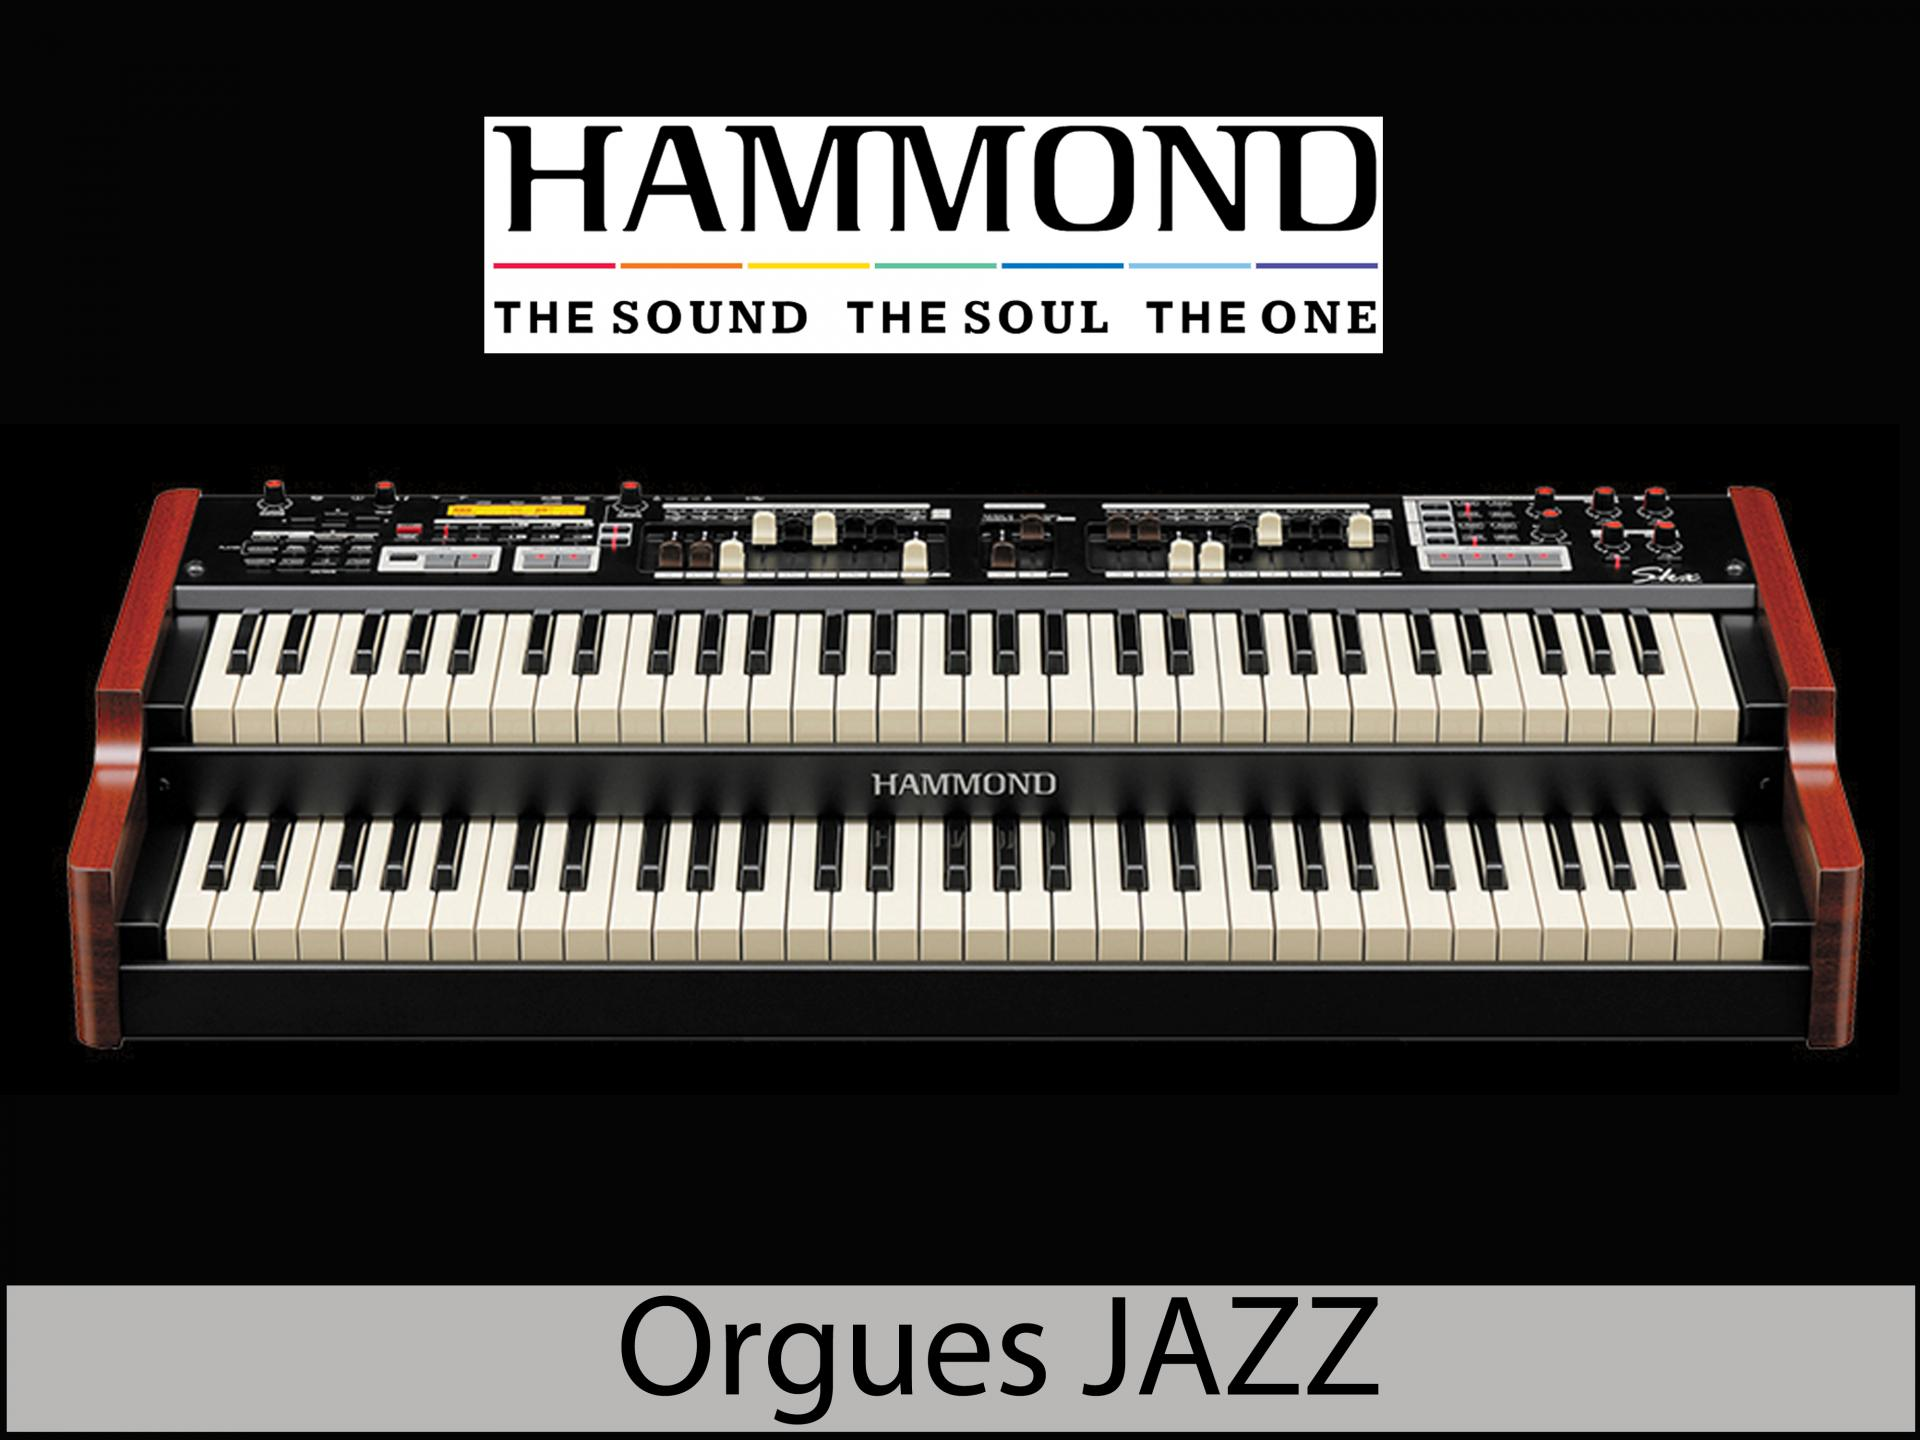 Orgues Jazz